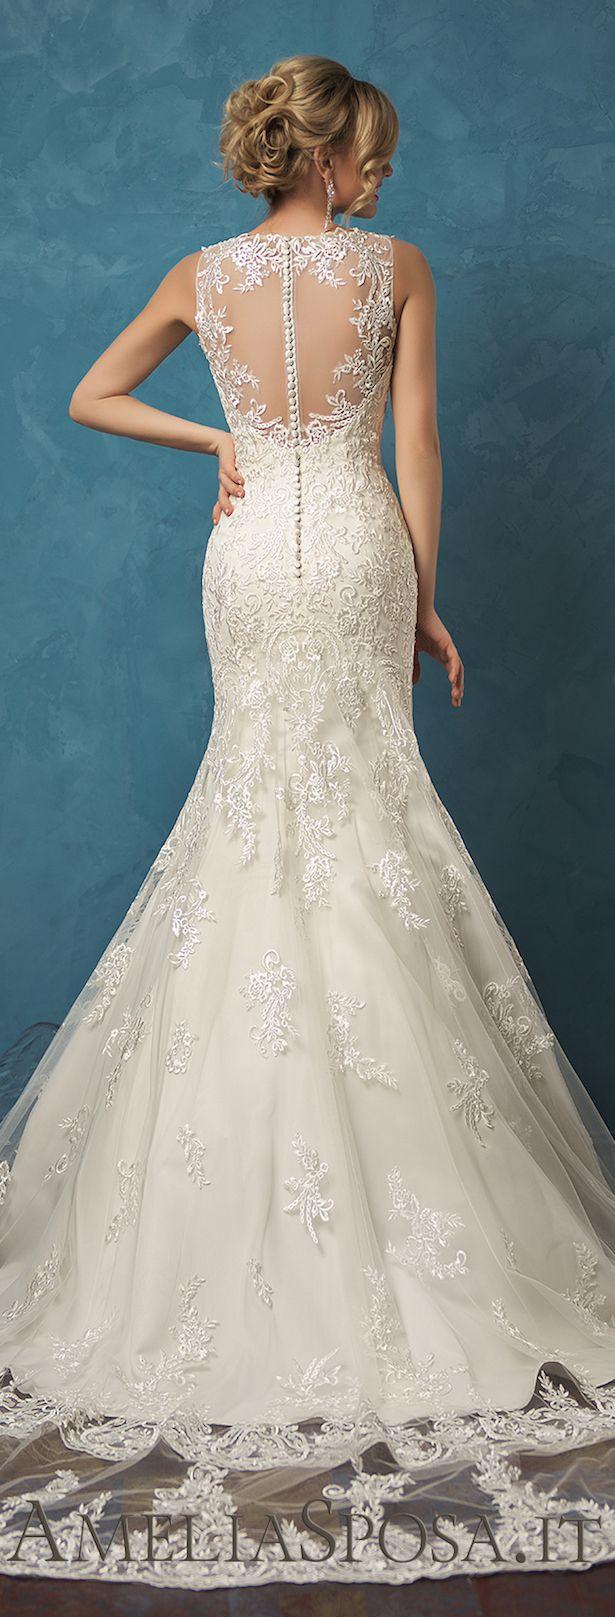 Amelia Sposa 2017 Wedding Dresses Dress And Weddings